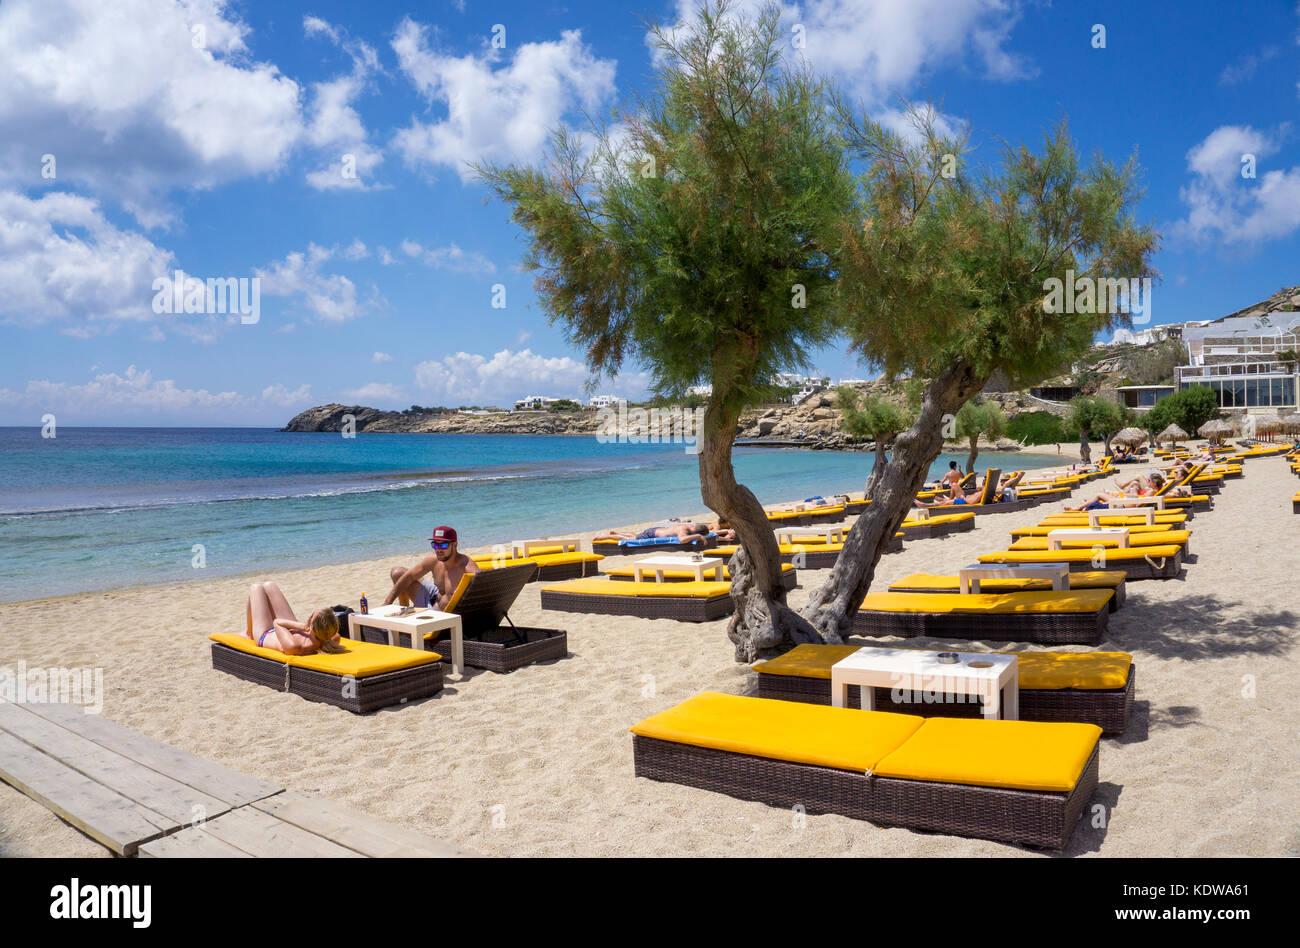 Tourists at Paradise beach, popular beach at Mykonos - Stock Image